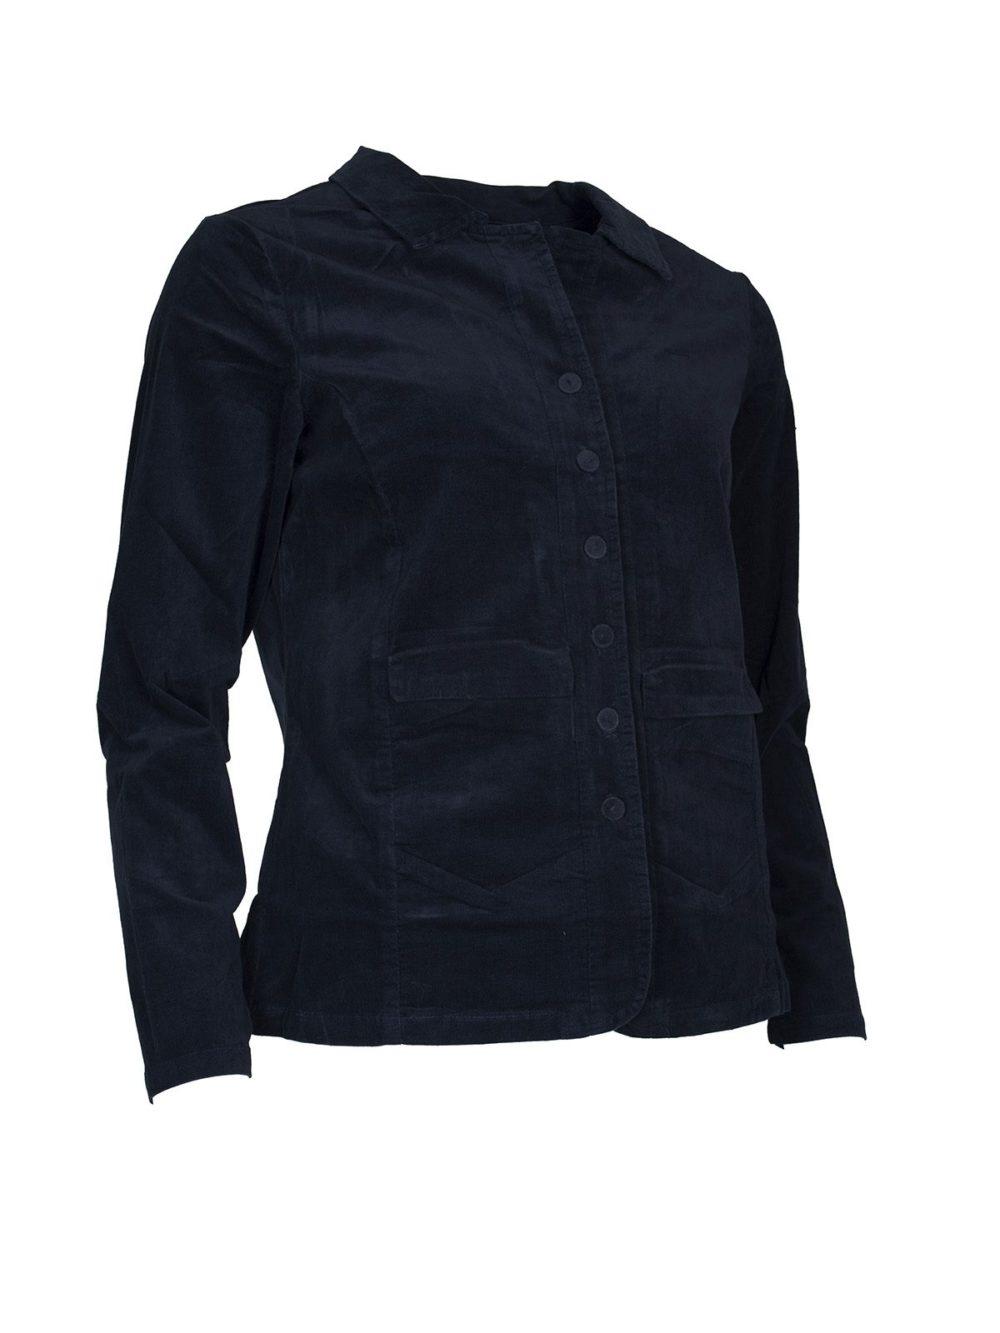 Kamao Jacket Kokomarina Women's clothing